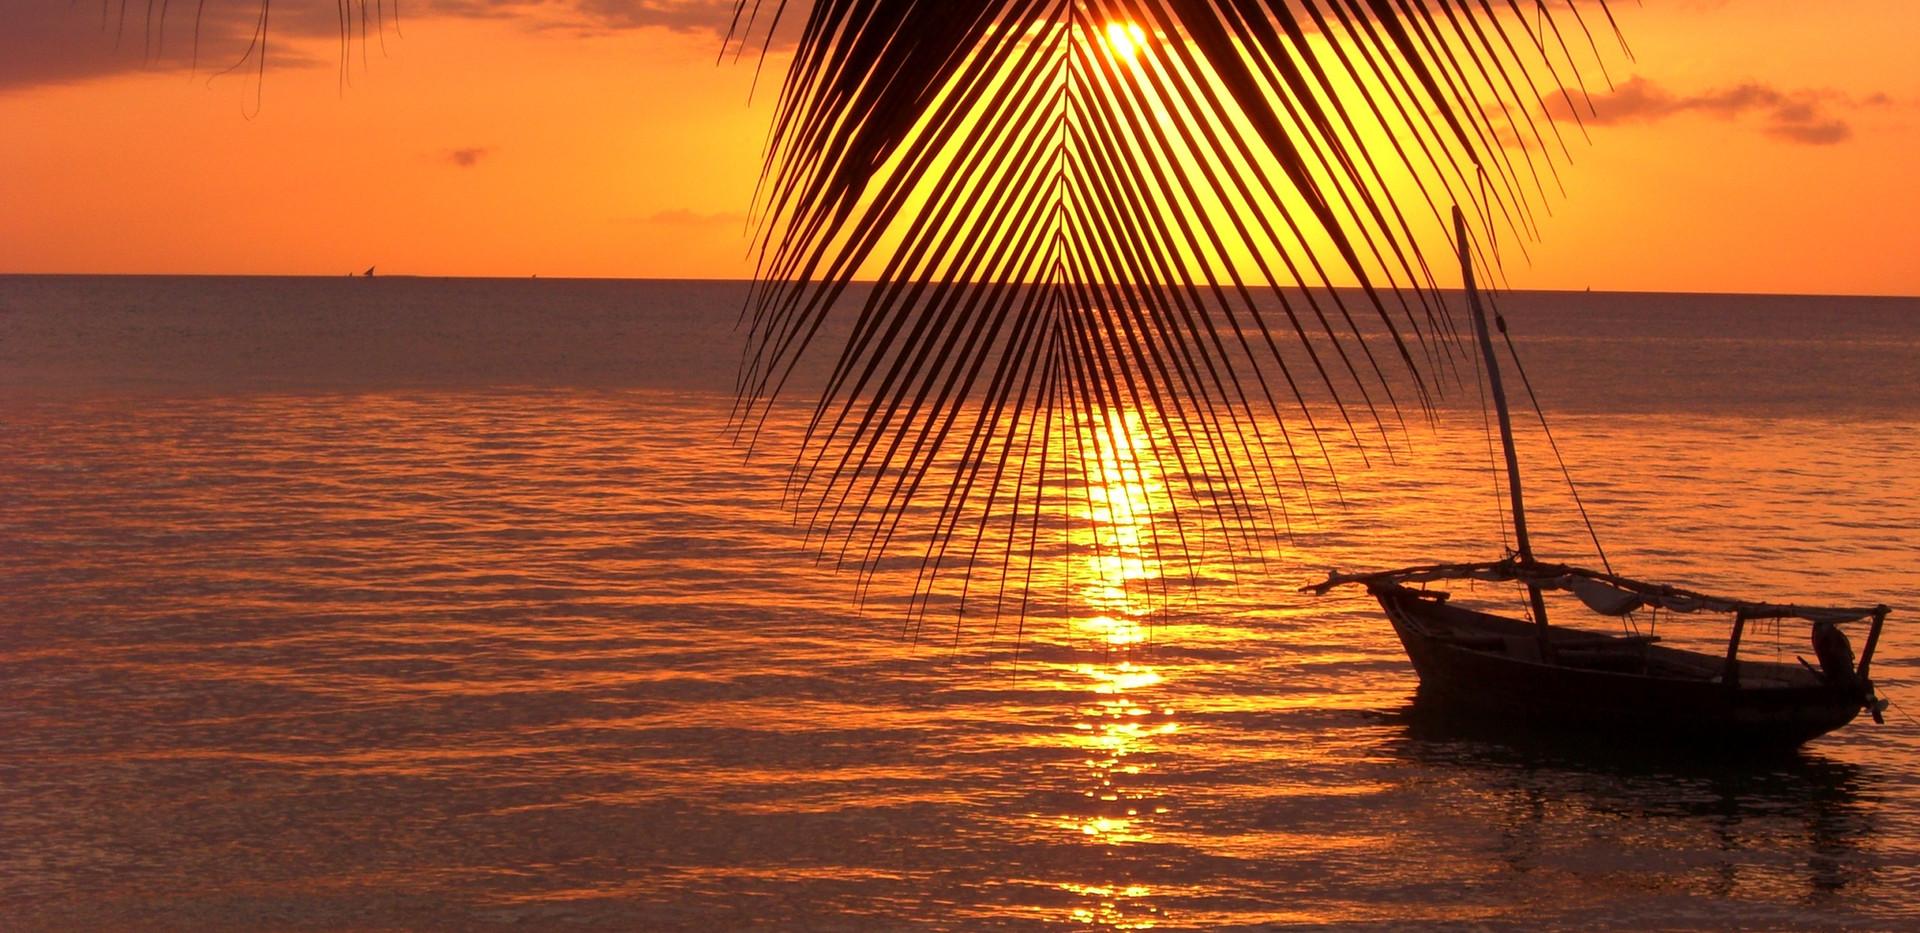 Sunset Cruise Tour